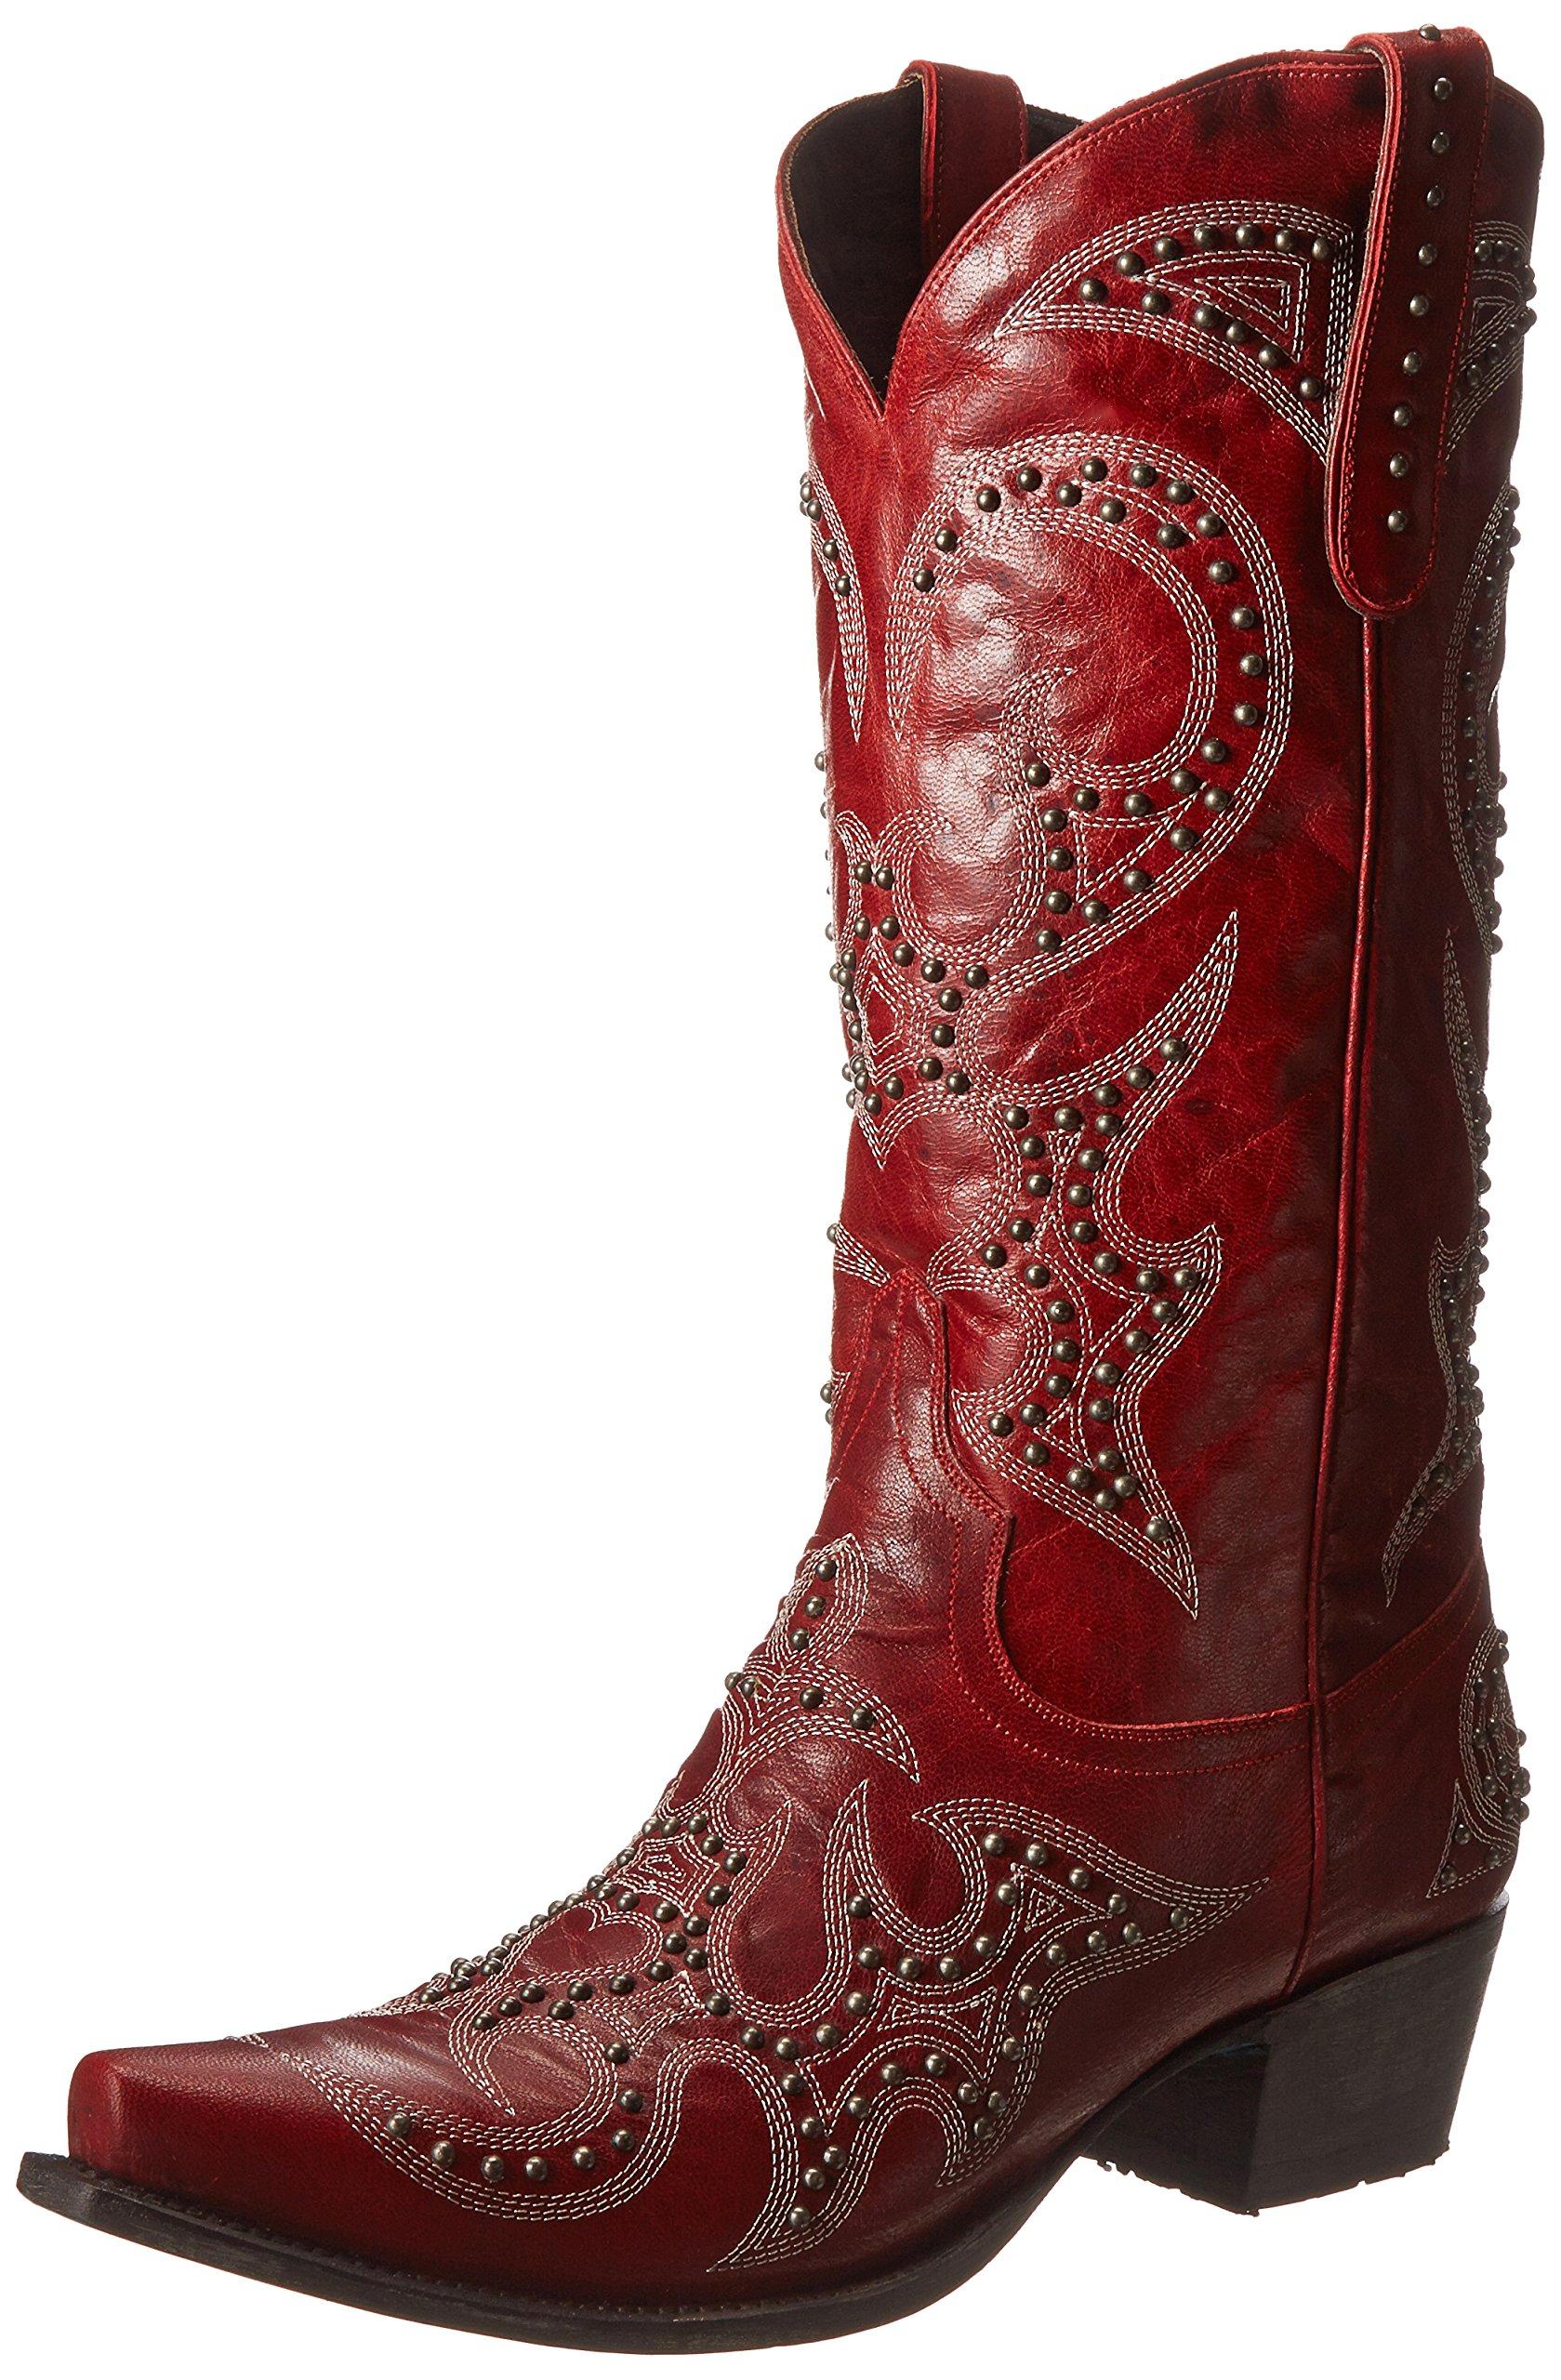 Lane Boots Women's Lovesick Stud Western Boot,Red,7.5 B US